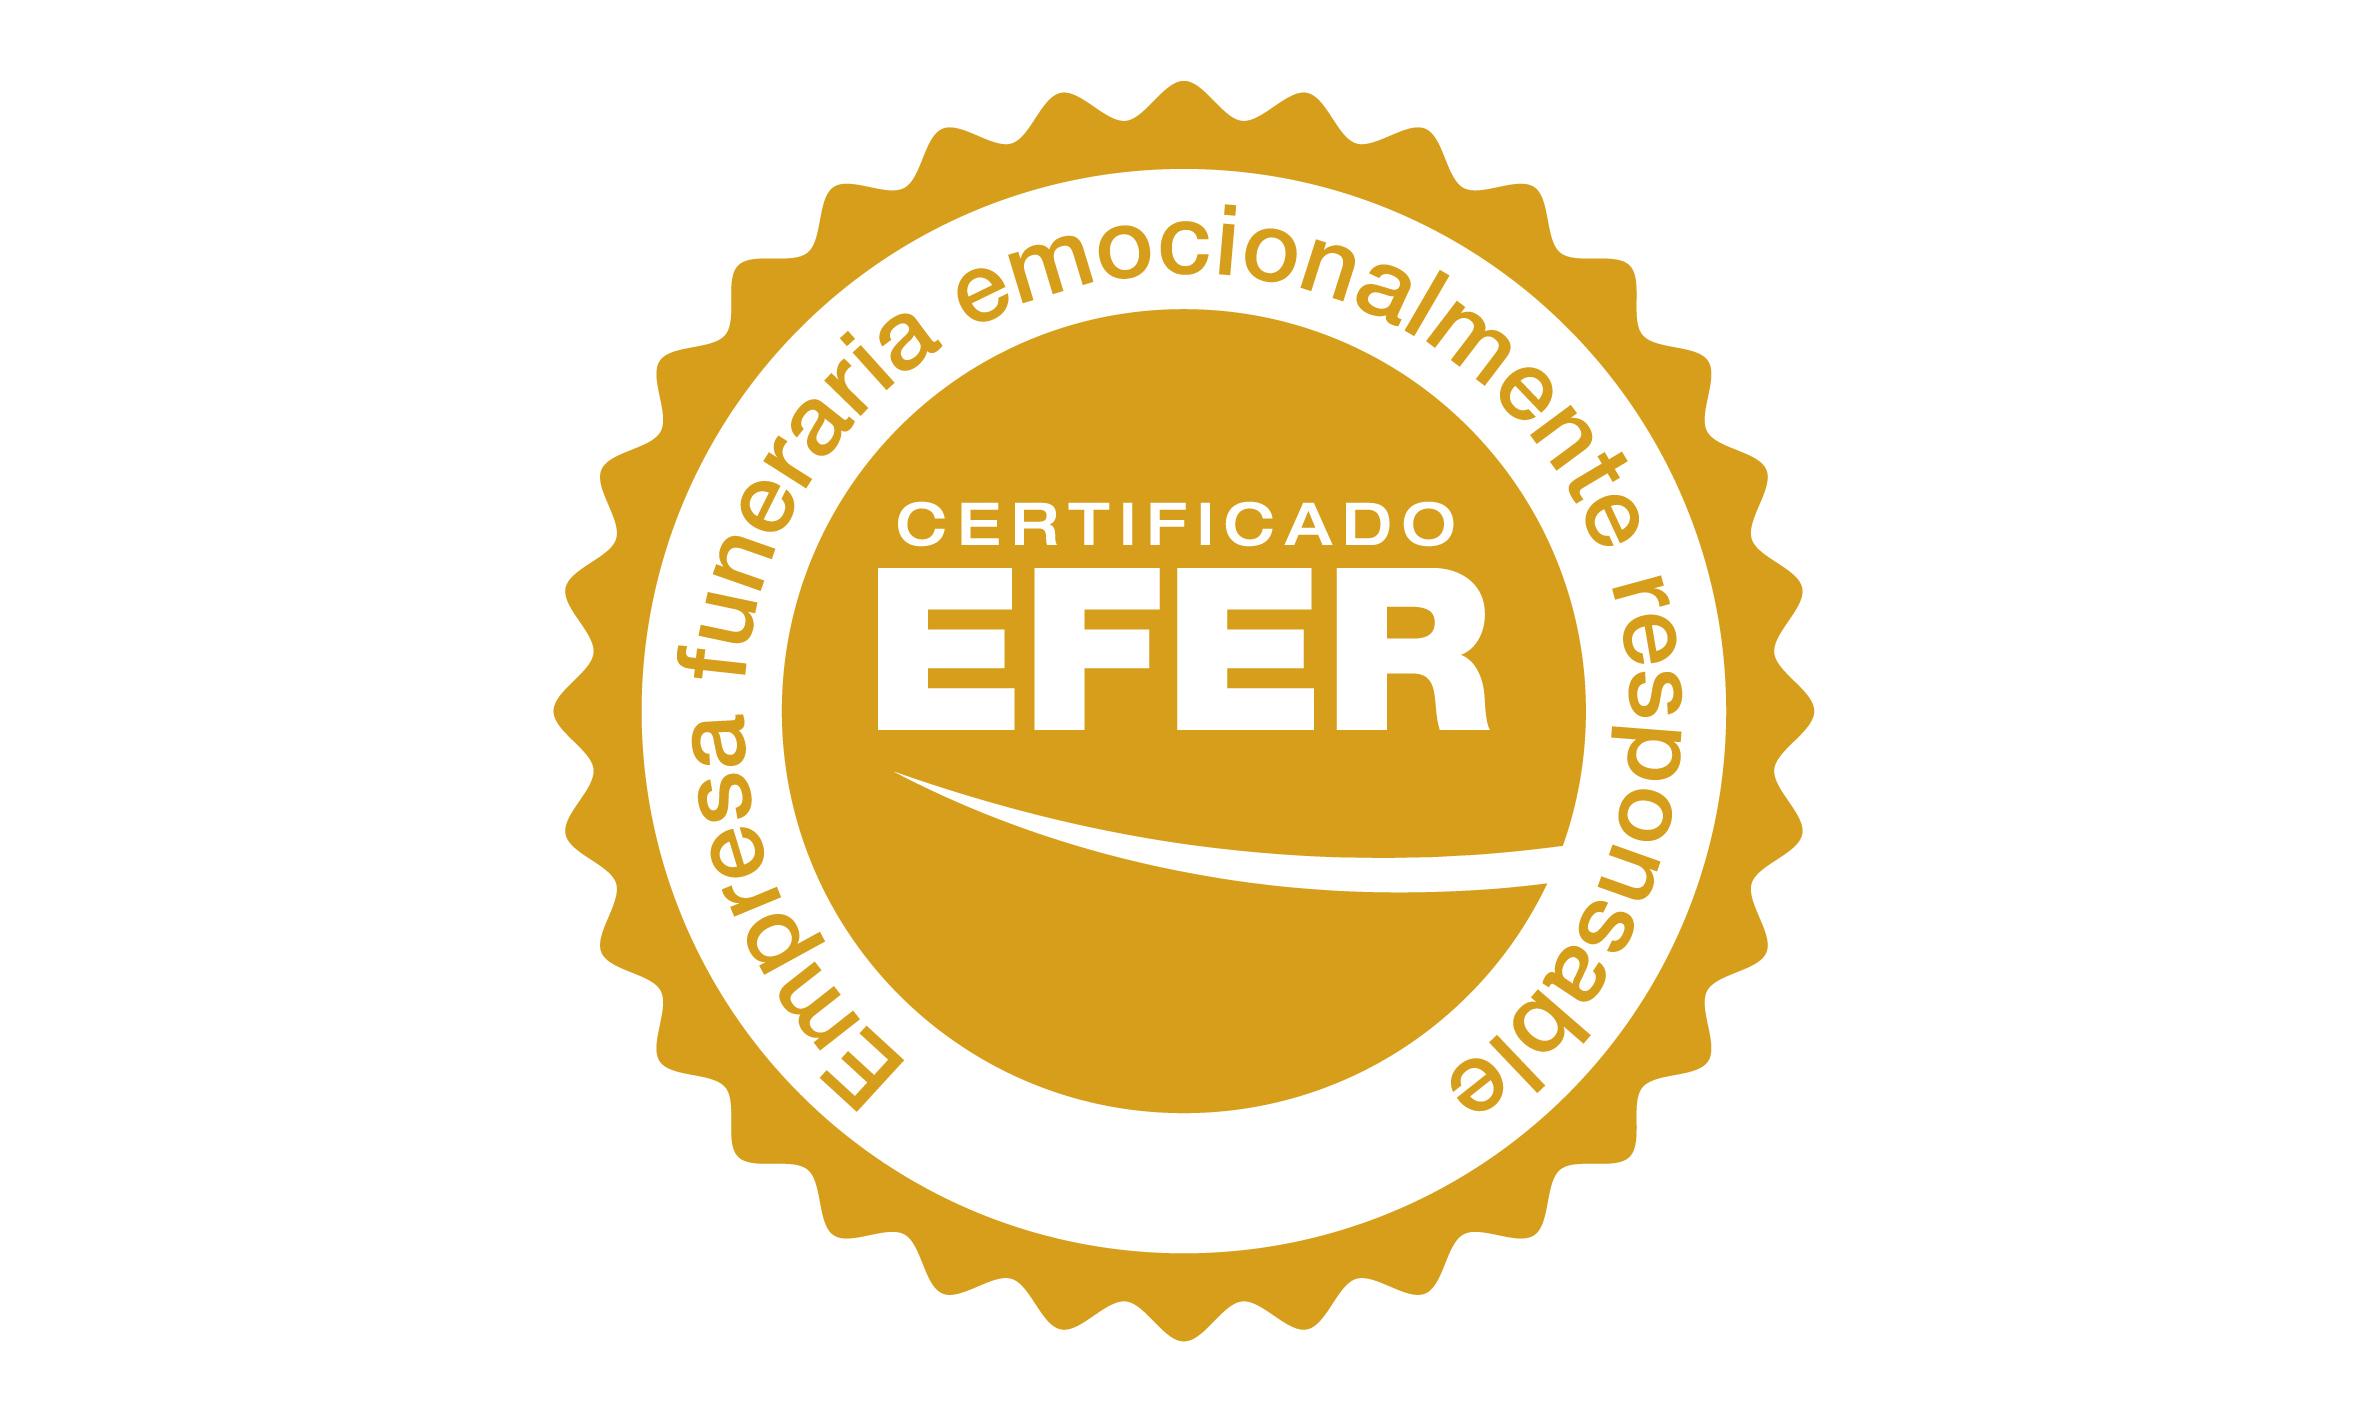 CERTIFICADO EFER_web